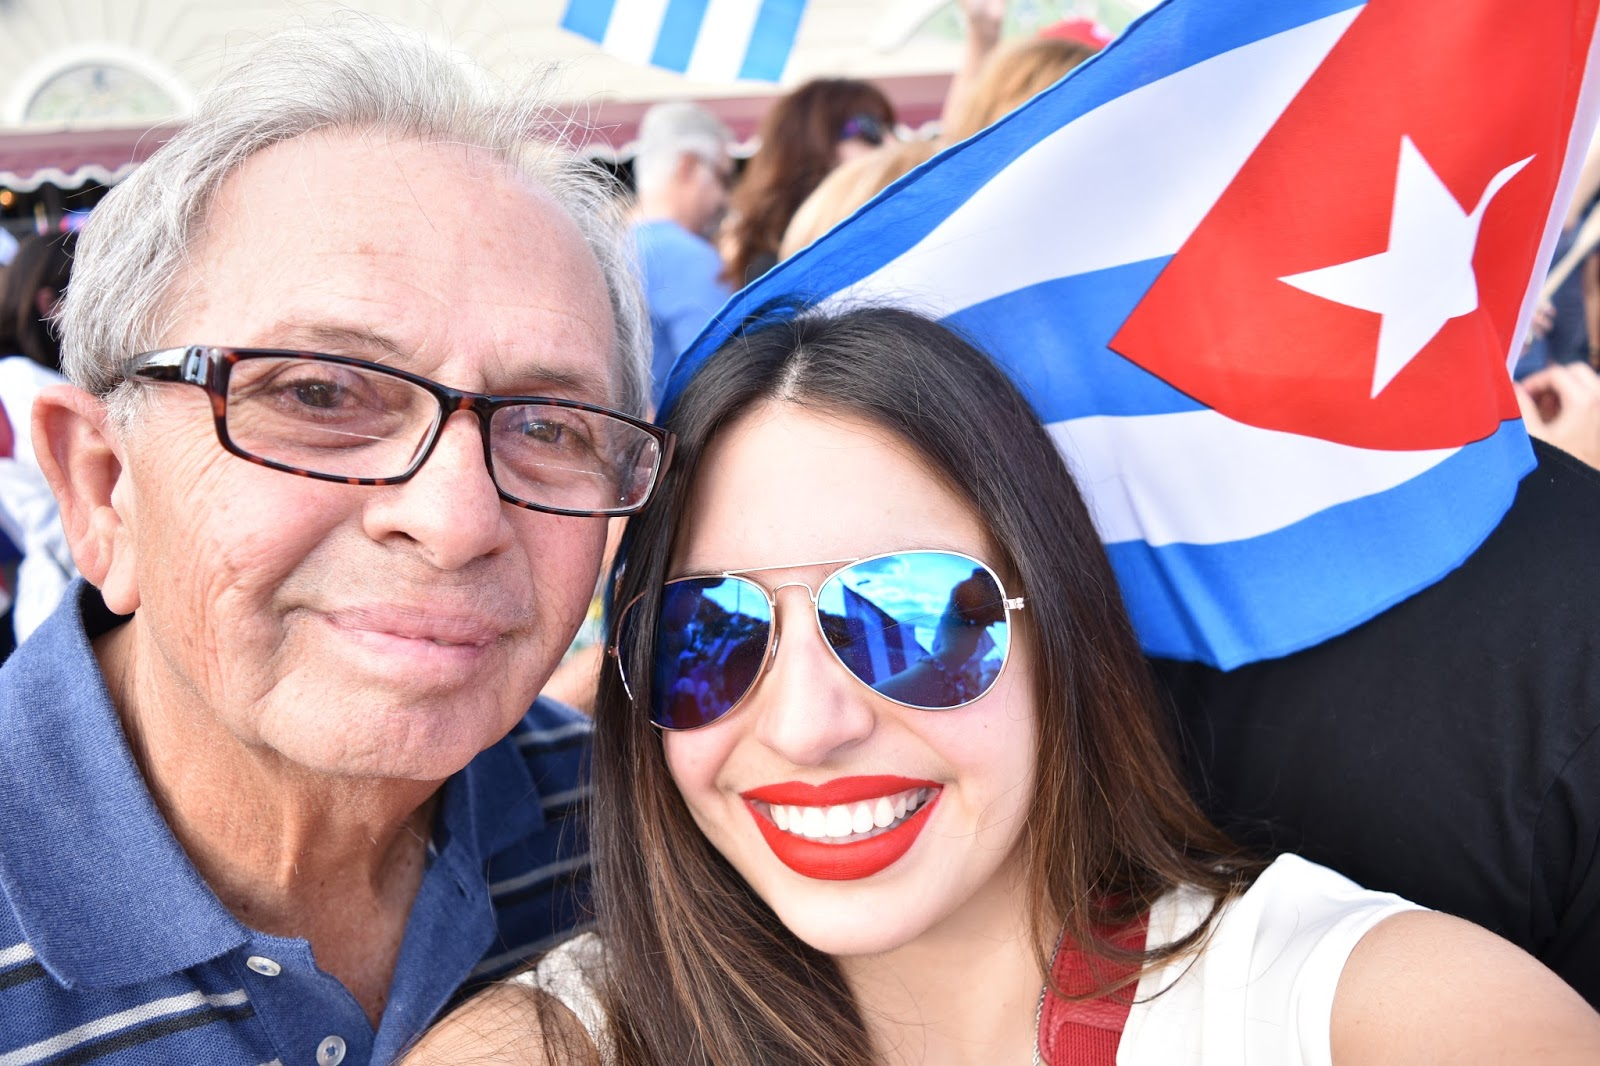 padre e hija celebrando la noticia